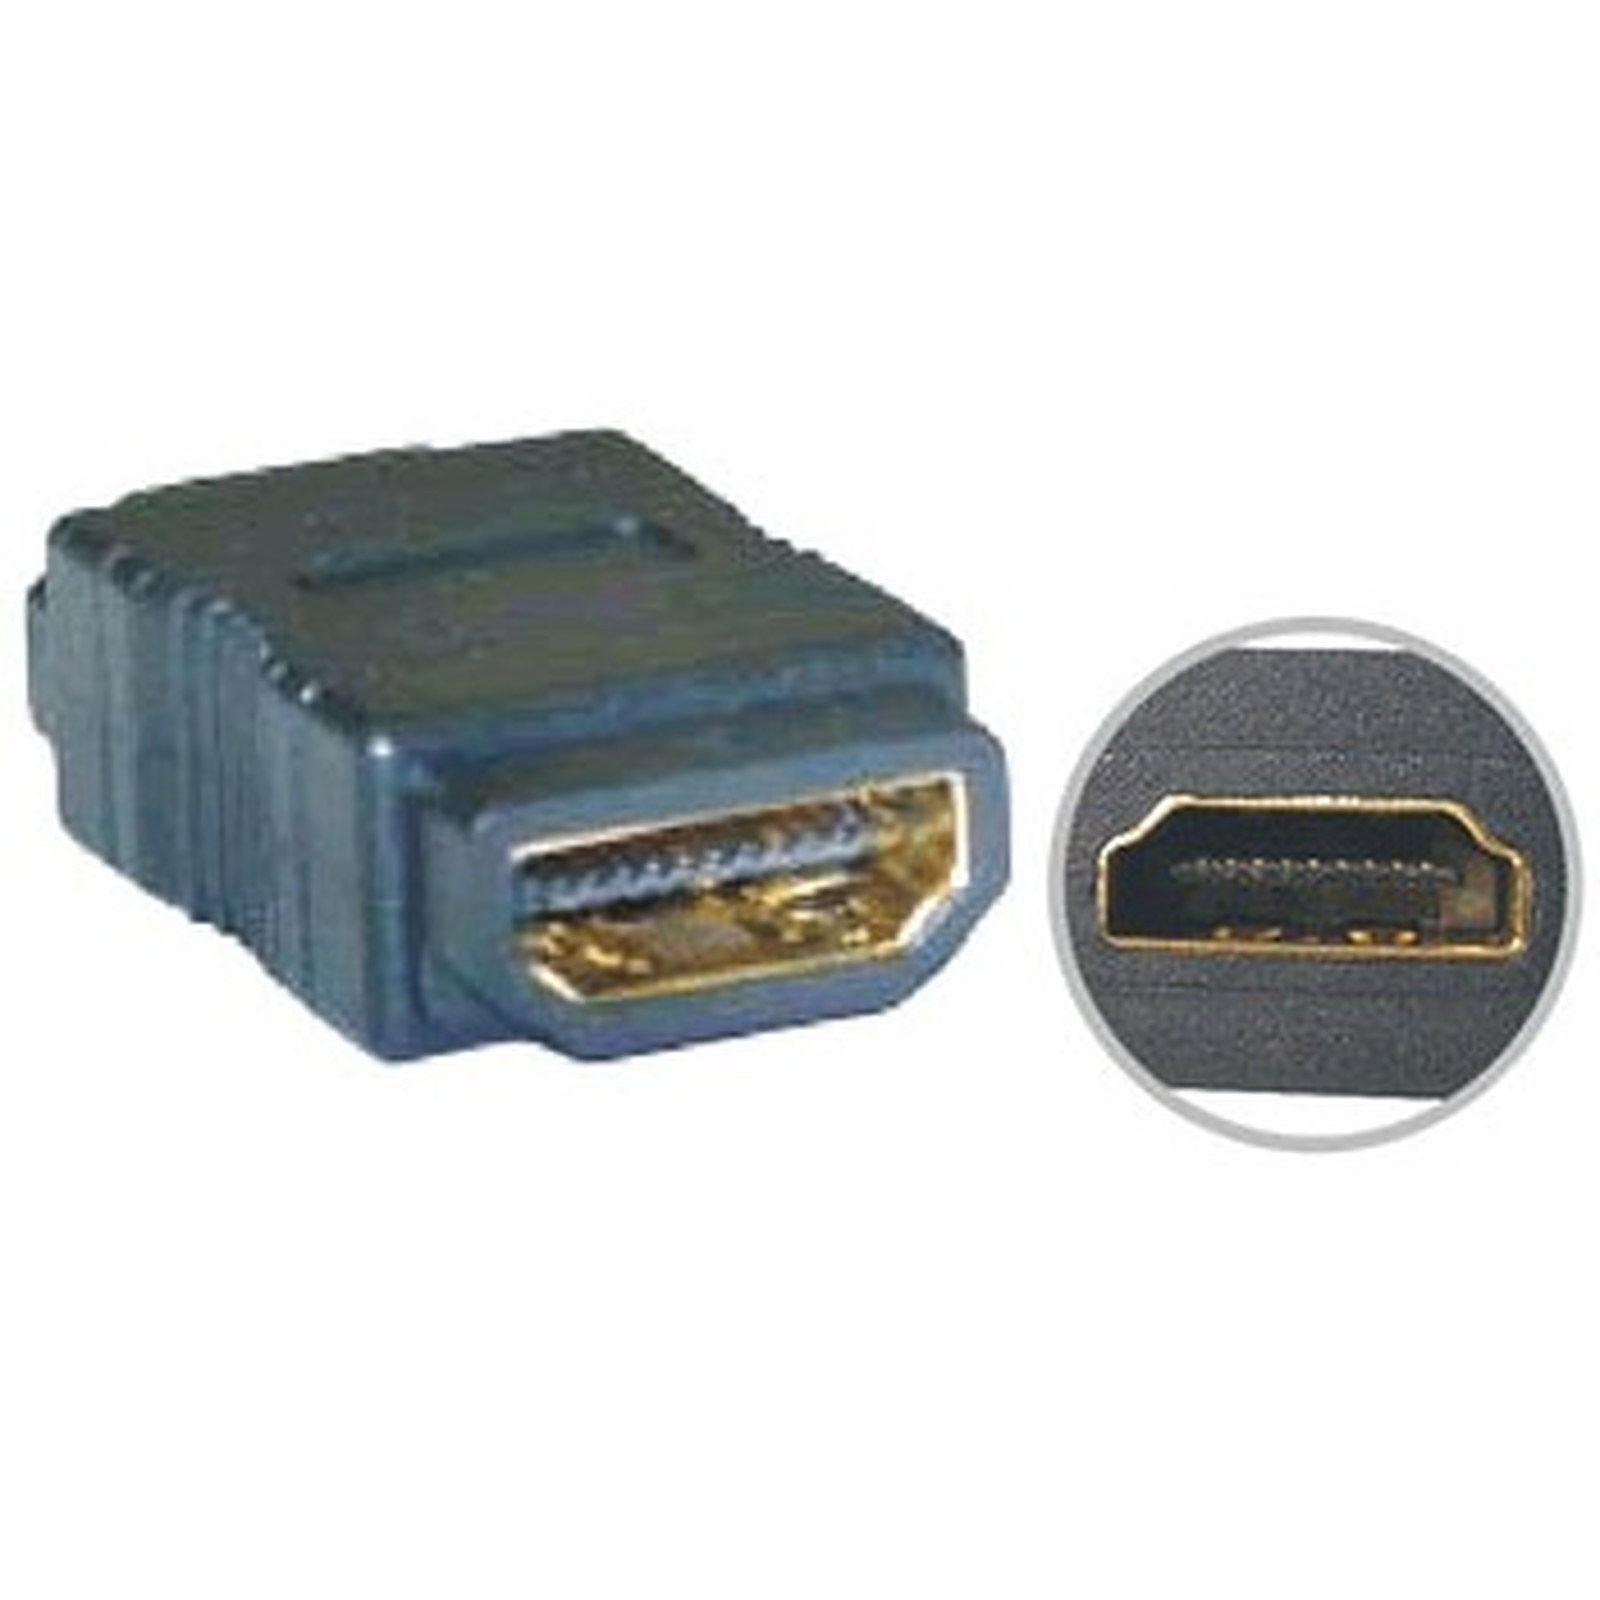 LDLC - Adaptateur HDMI 19 broches Femelle - Femelle